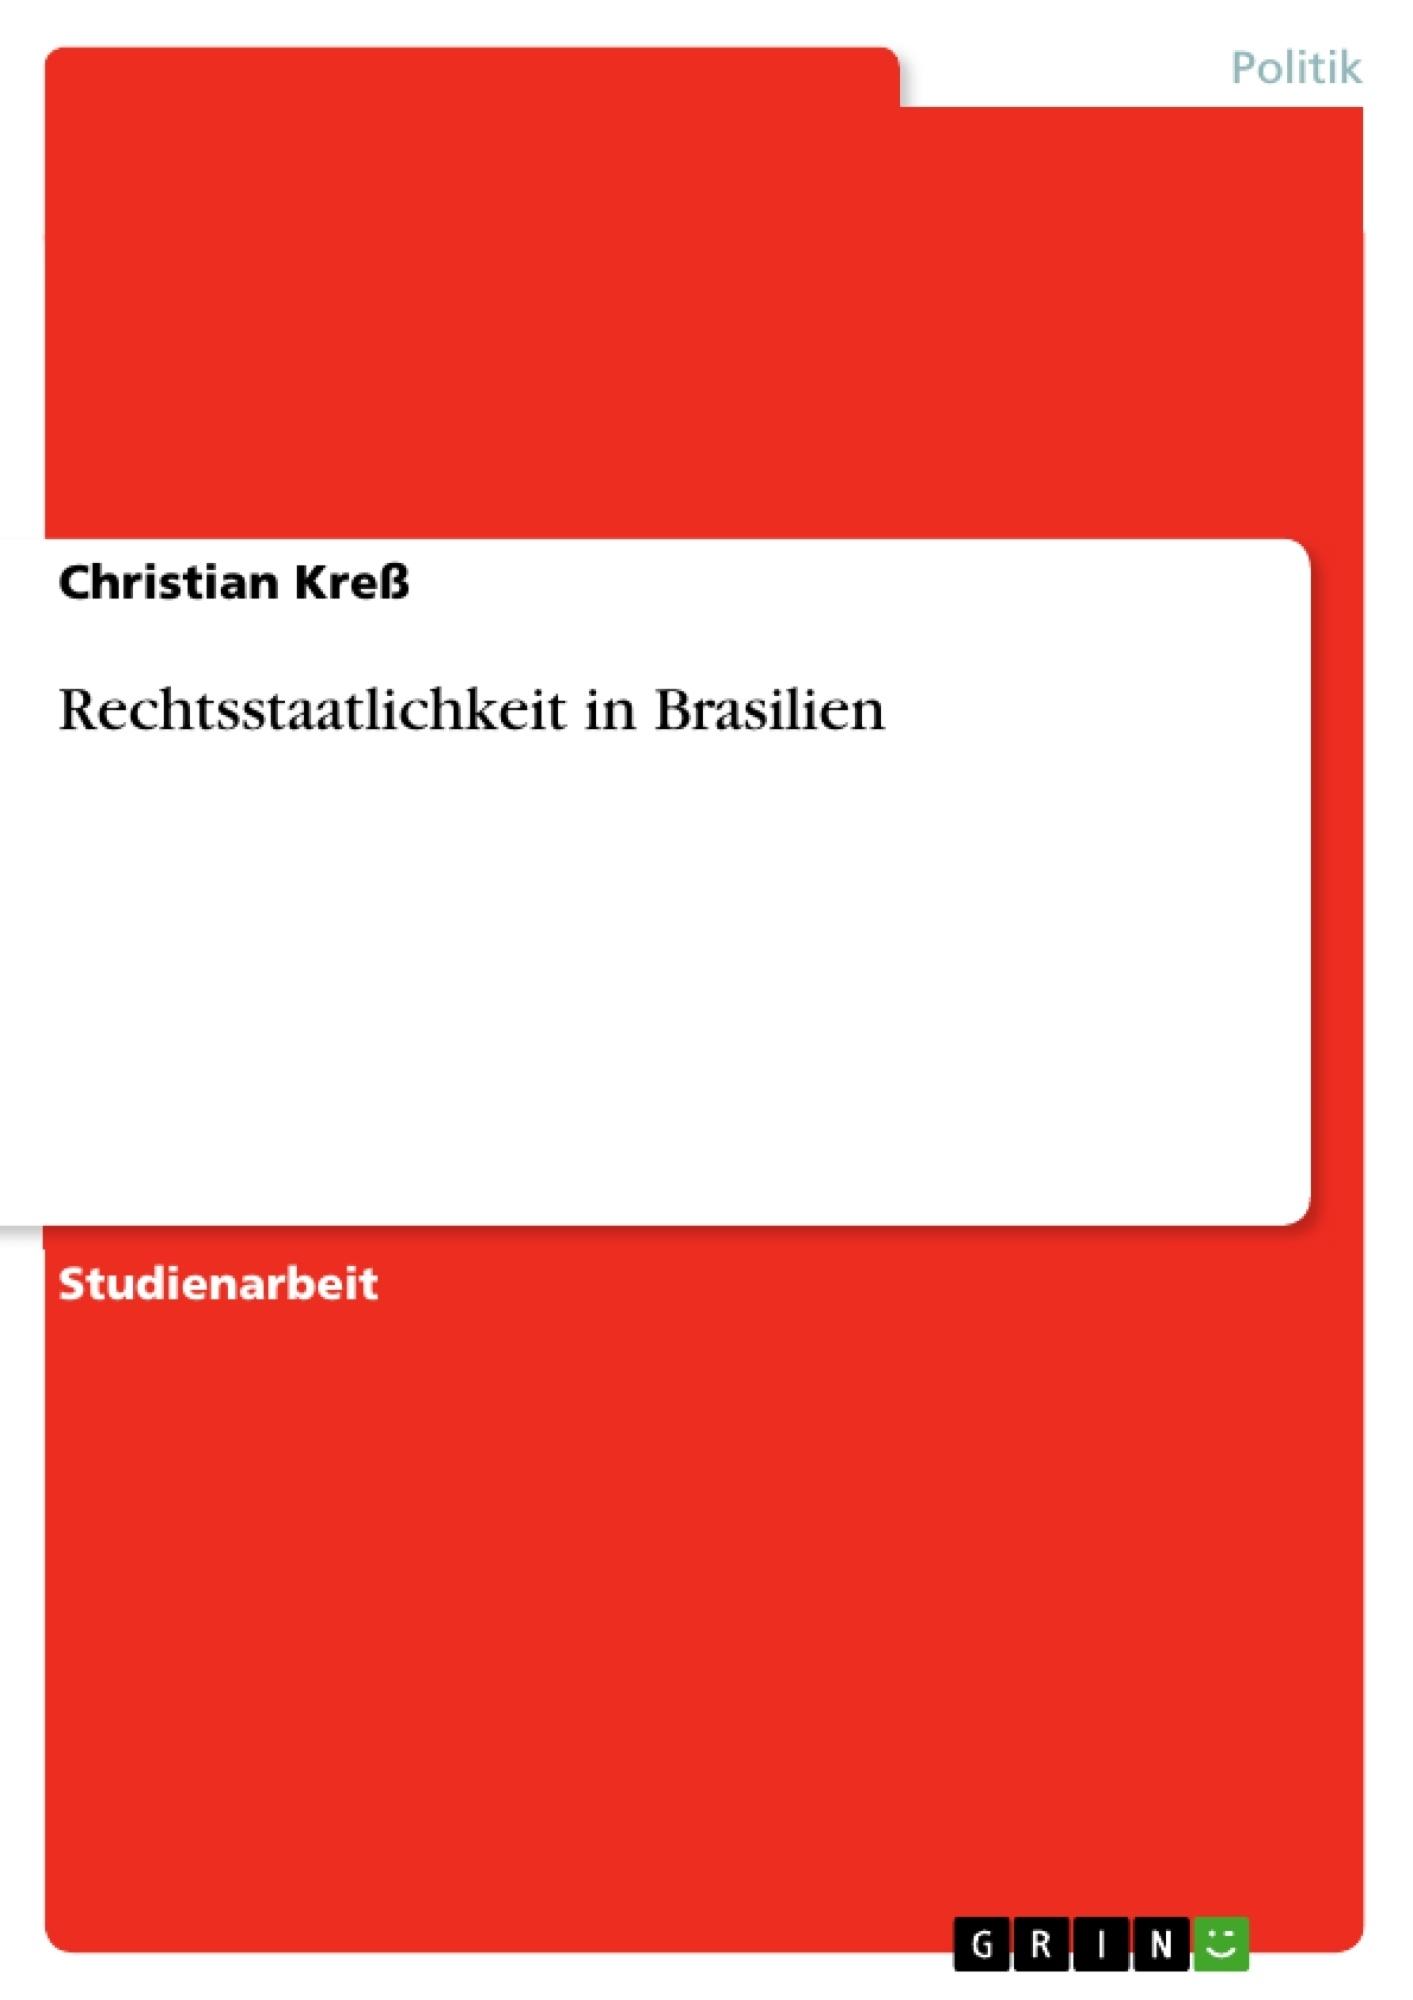 Titel: Rechtsstaatlichkeit in Brasilien